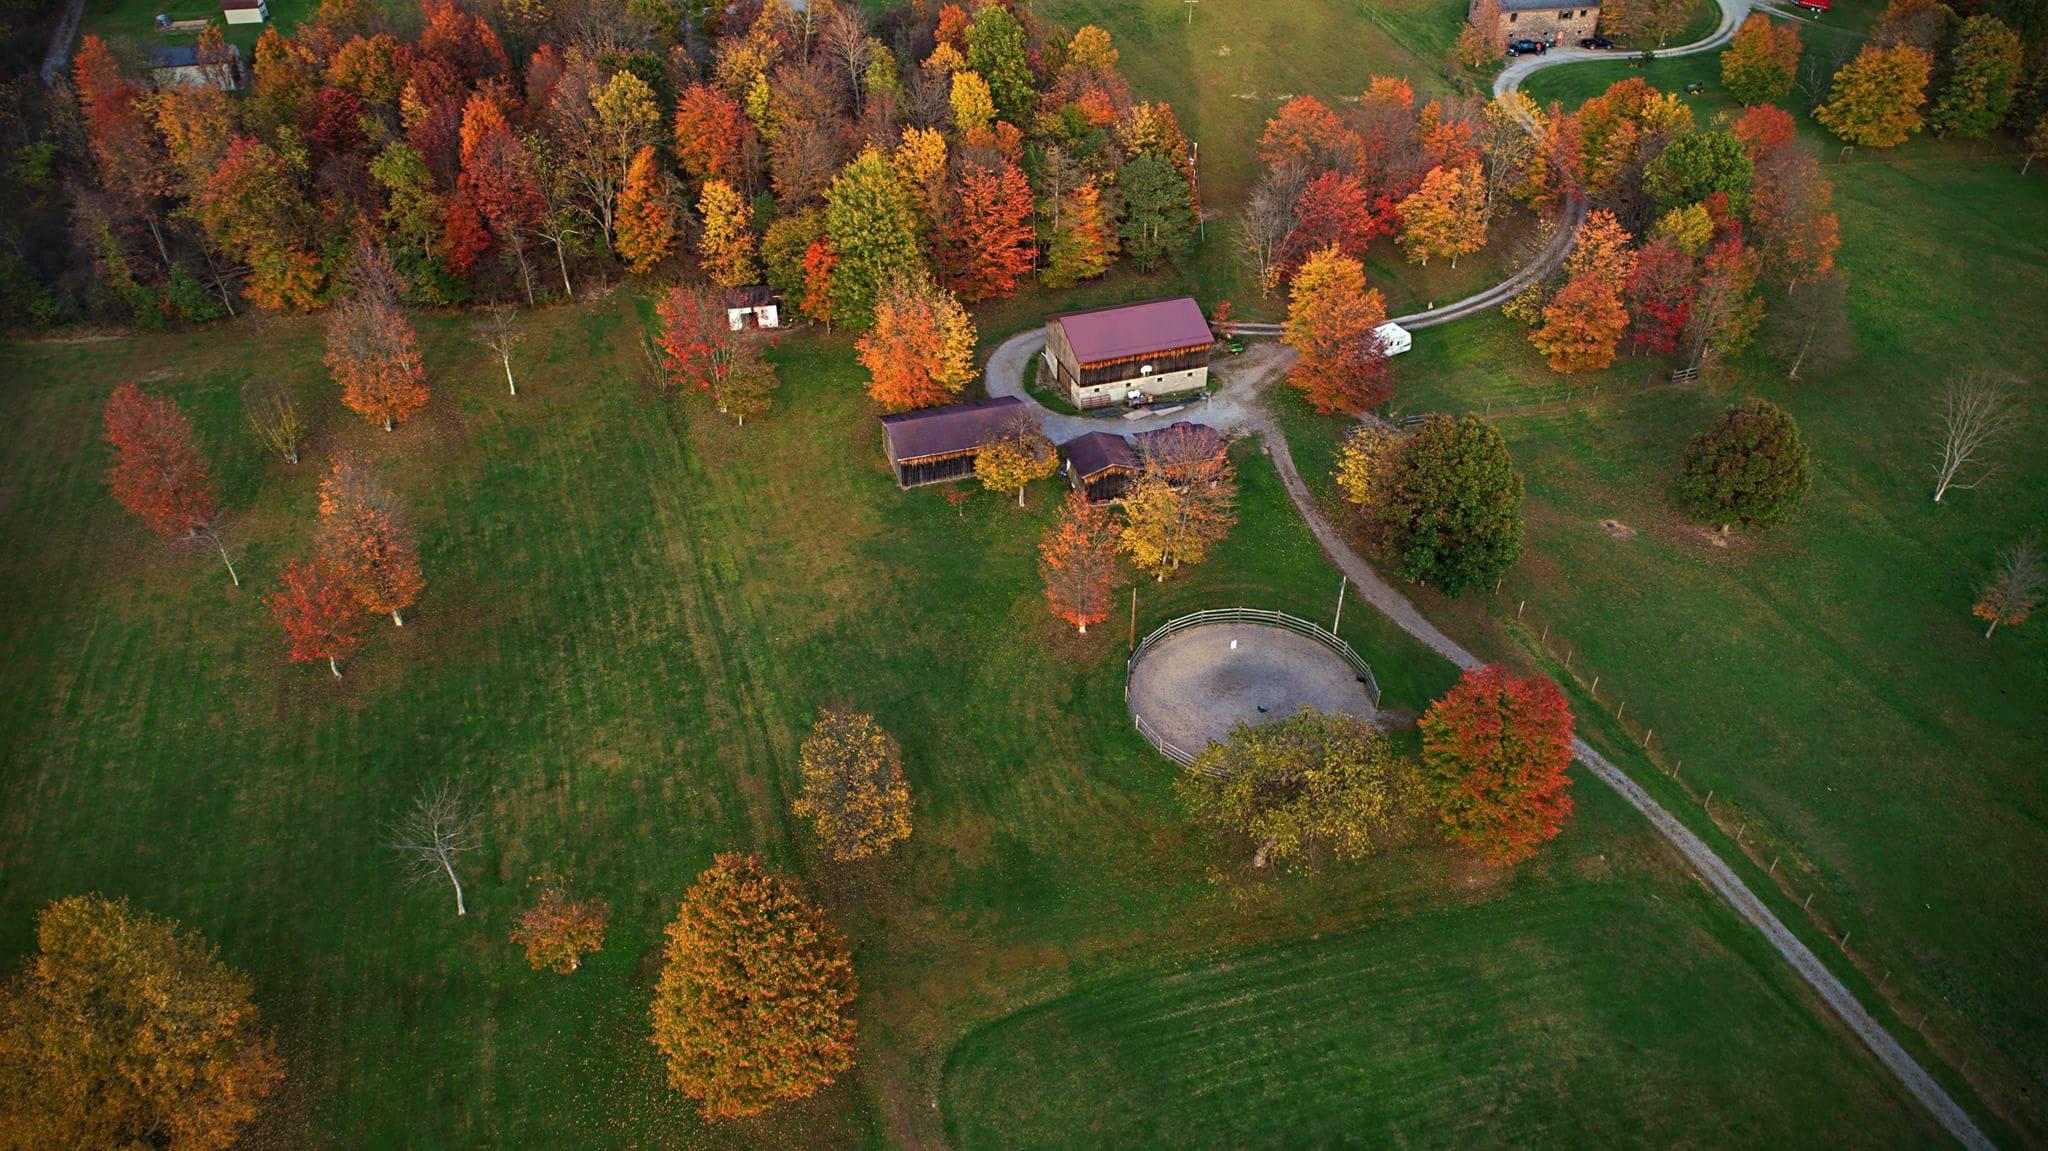 greensburg drone aerial photographer